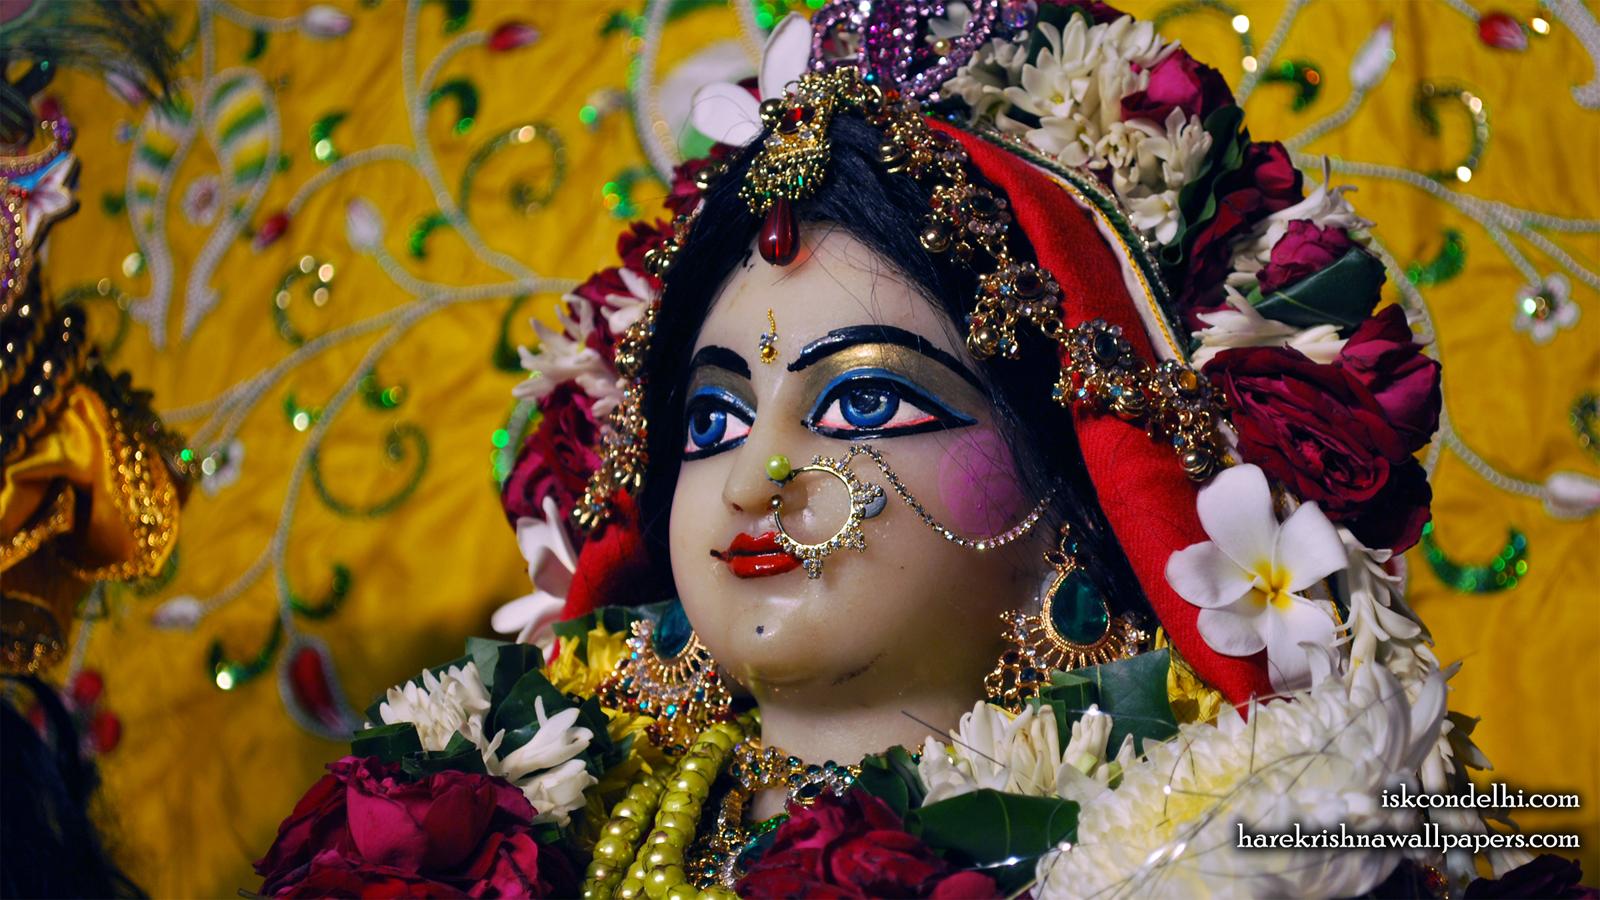 Sri Radha Close up Wallpaper (012) Size 1600x900 Download